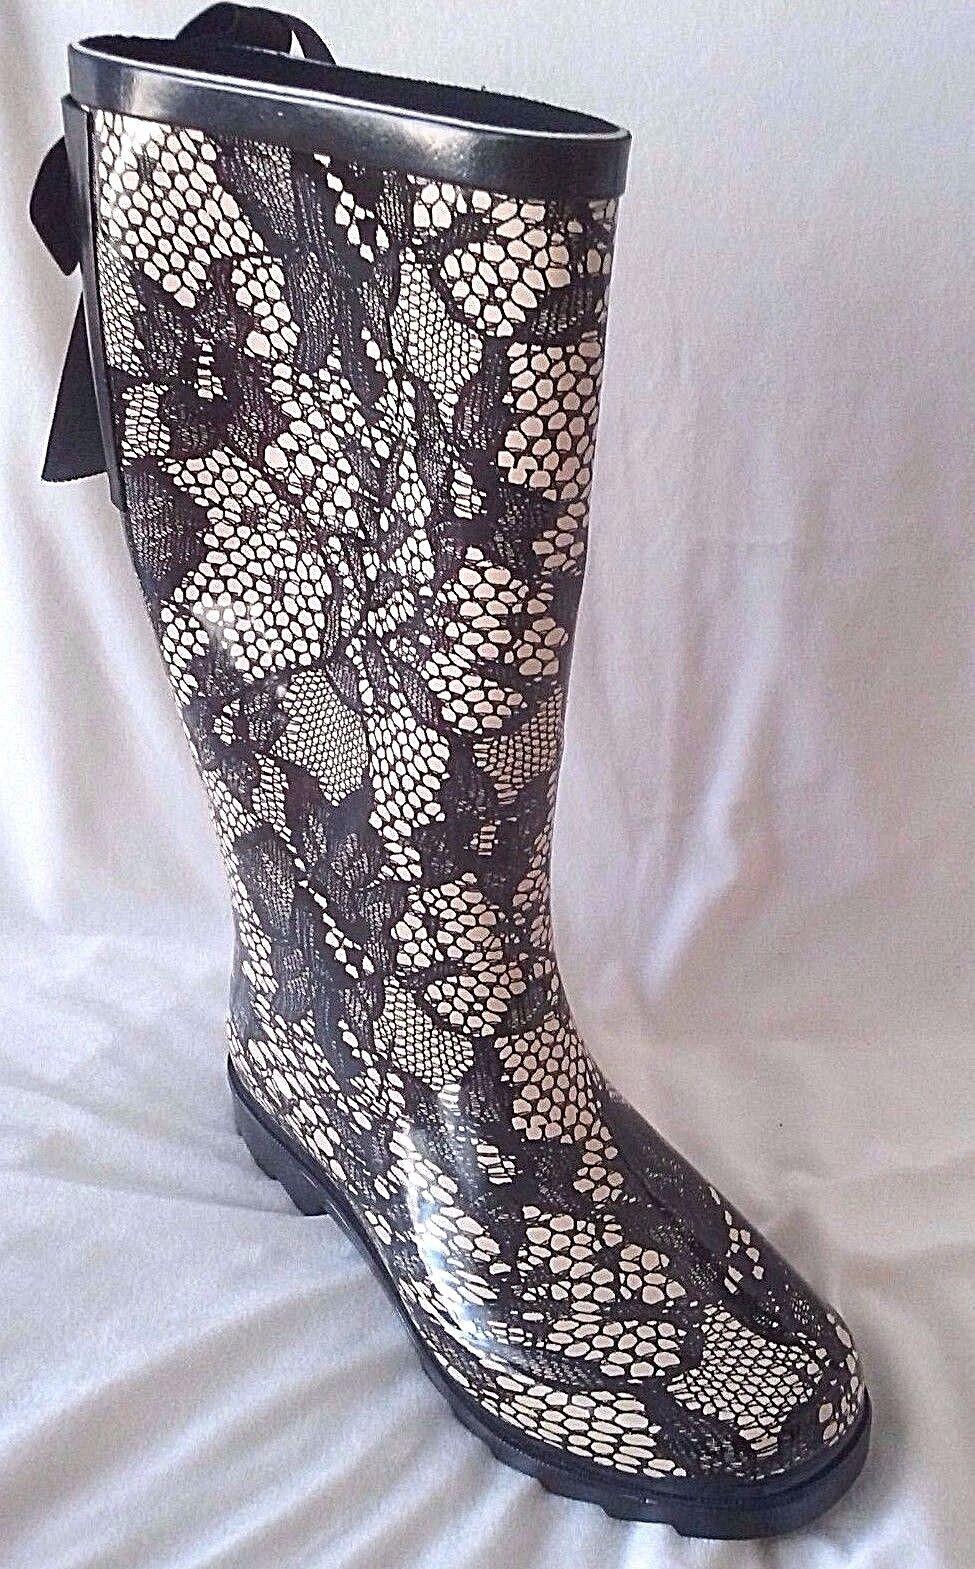 Corset Back Lace Print Vermont Rain Boots Treaded Sole HENRY FERRERA